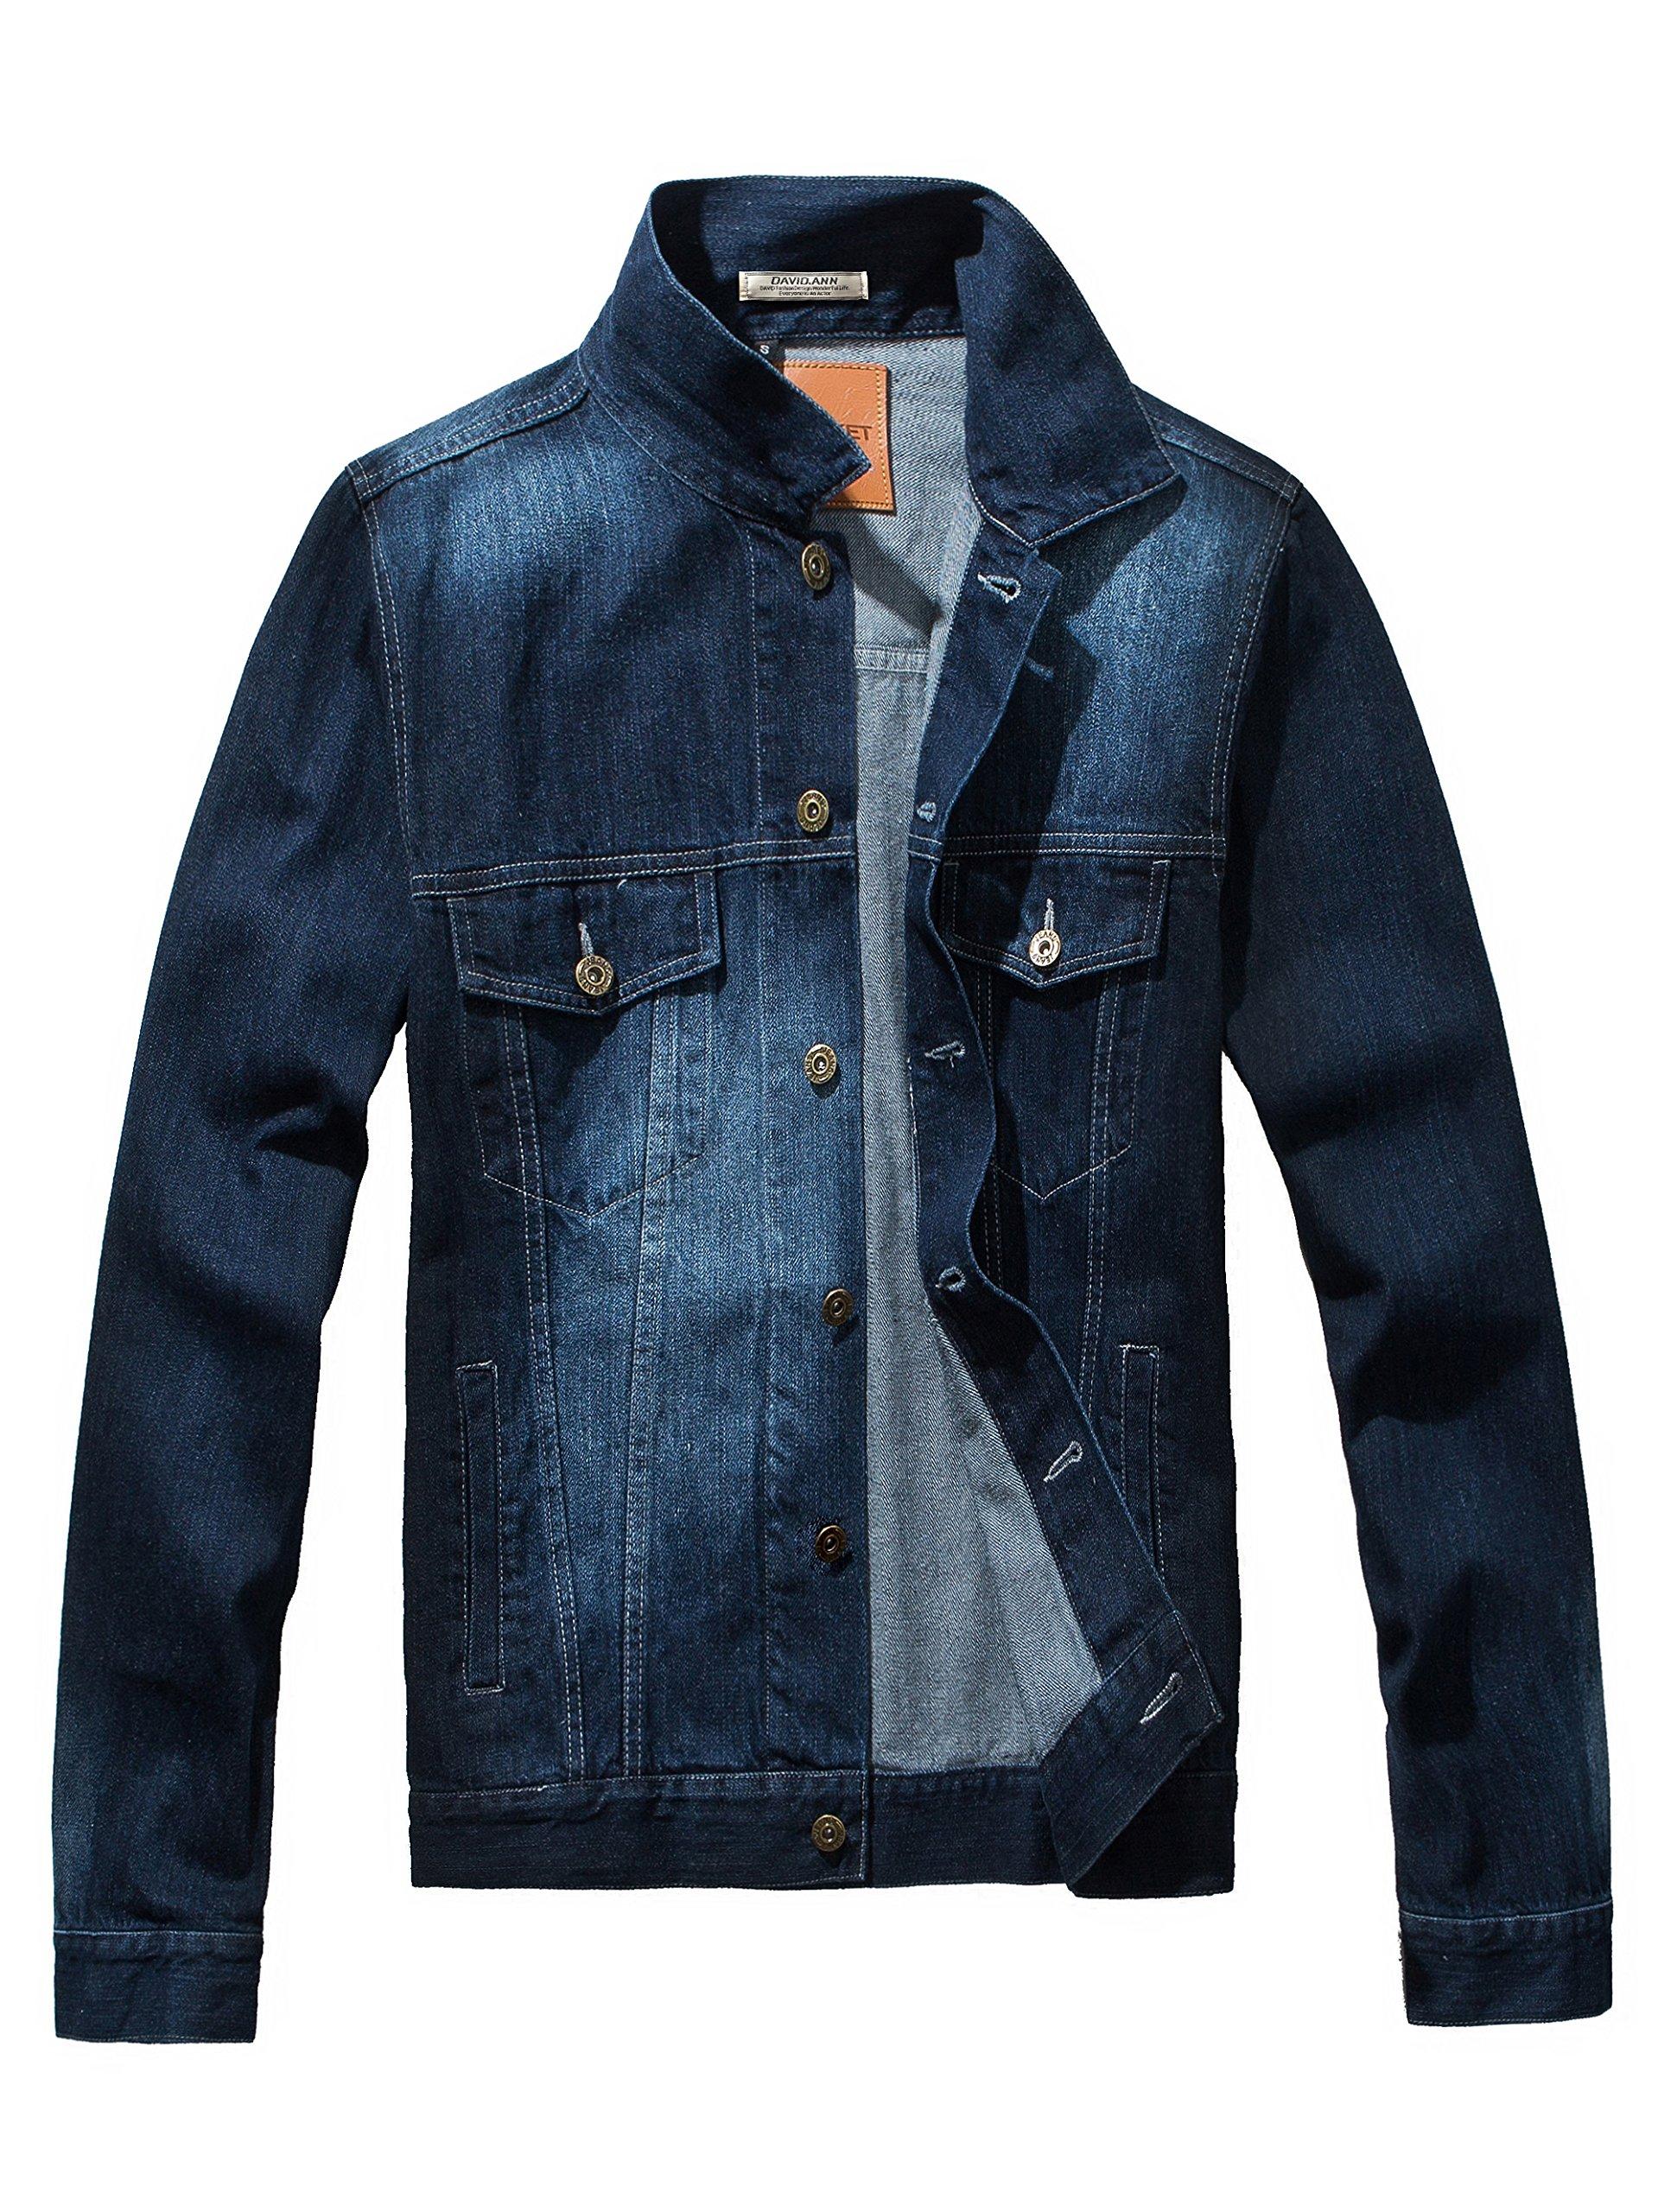 DAVID.ANN Men's Denim Jacket Slim Fit Trucker Coat,Dark Blue,X-Large by DAVID.ANN